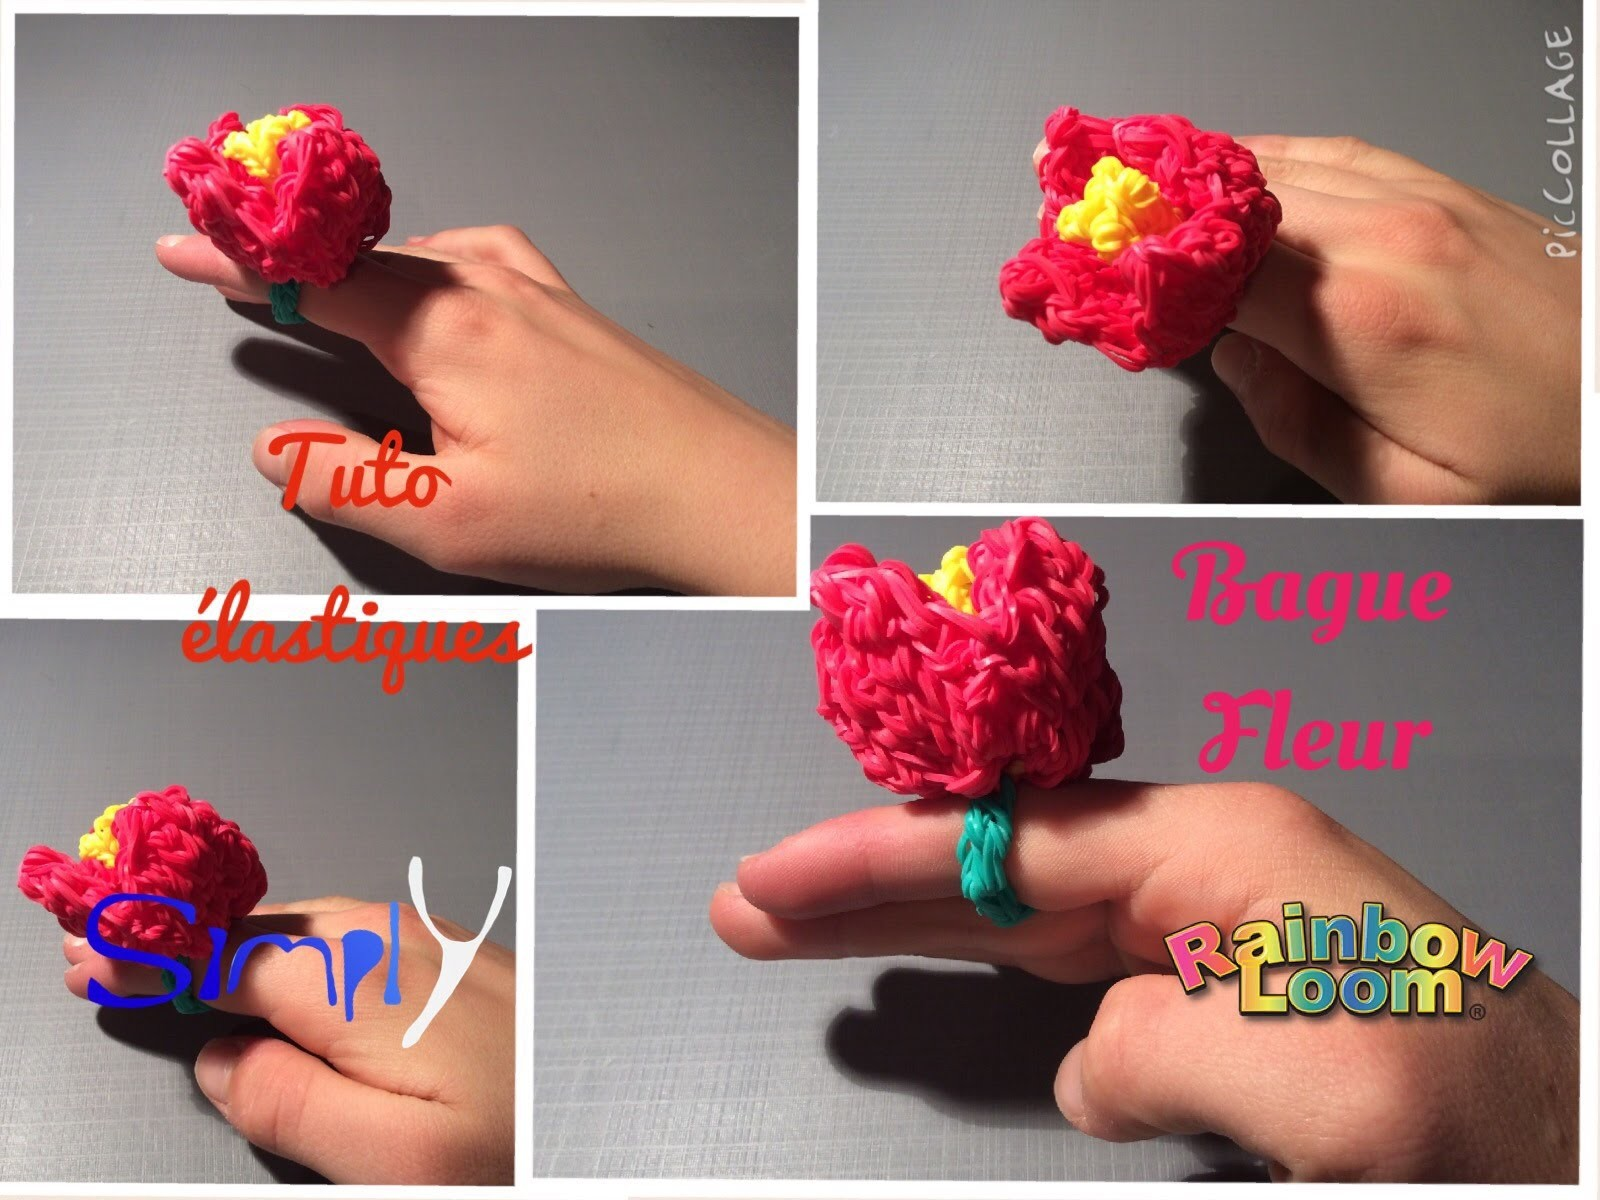 Tuto { Bague fleur 3D en elastiques Rainbow Loom } Simply